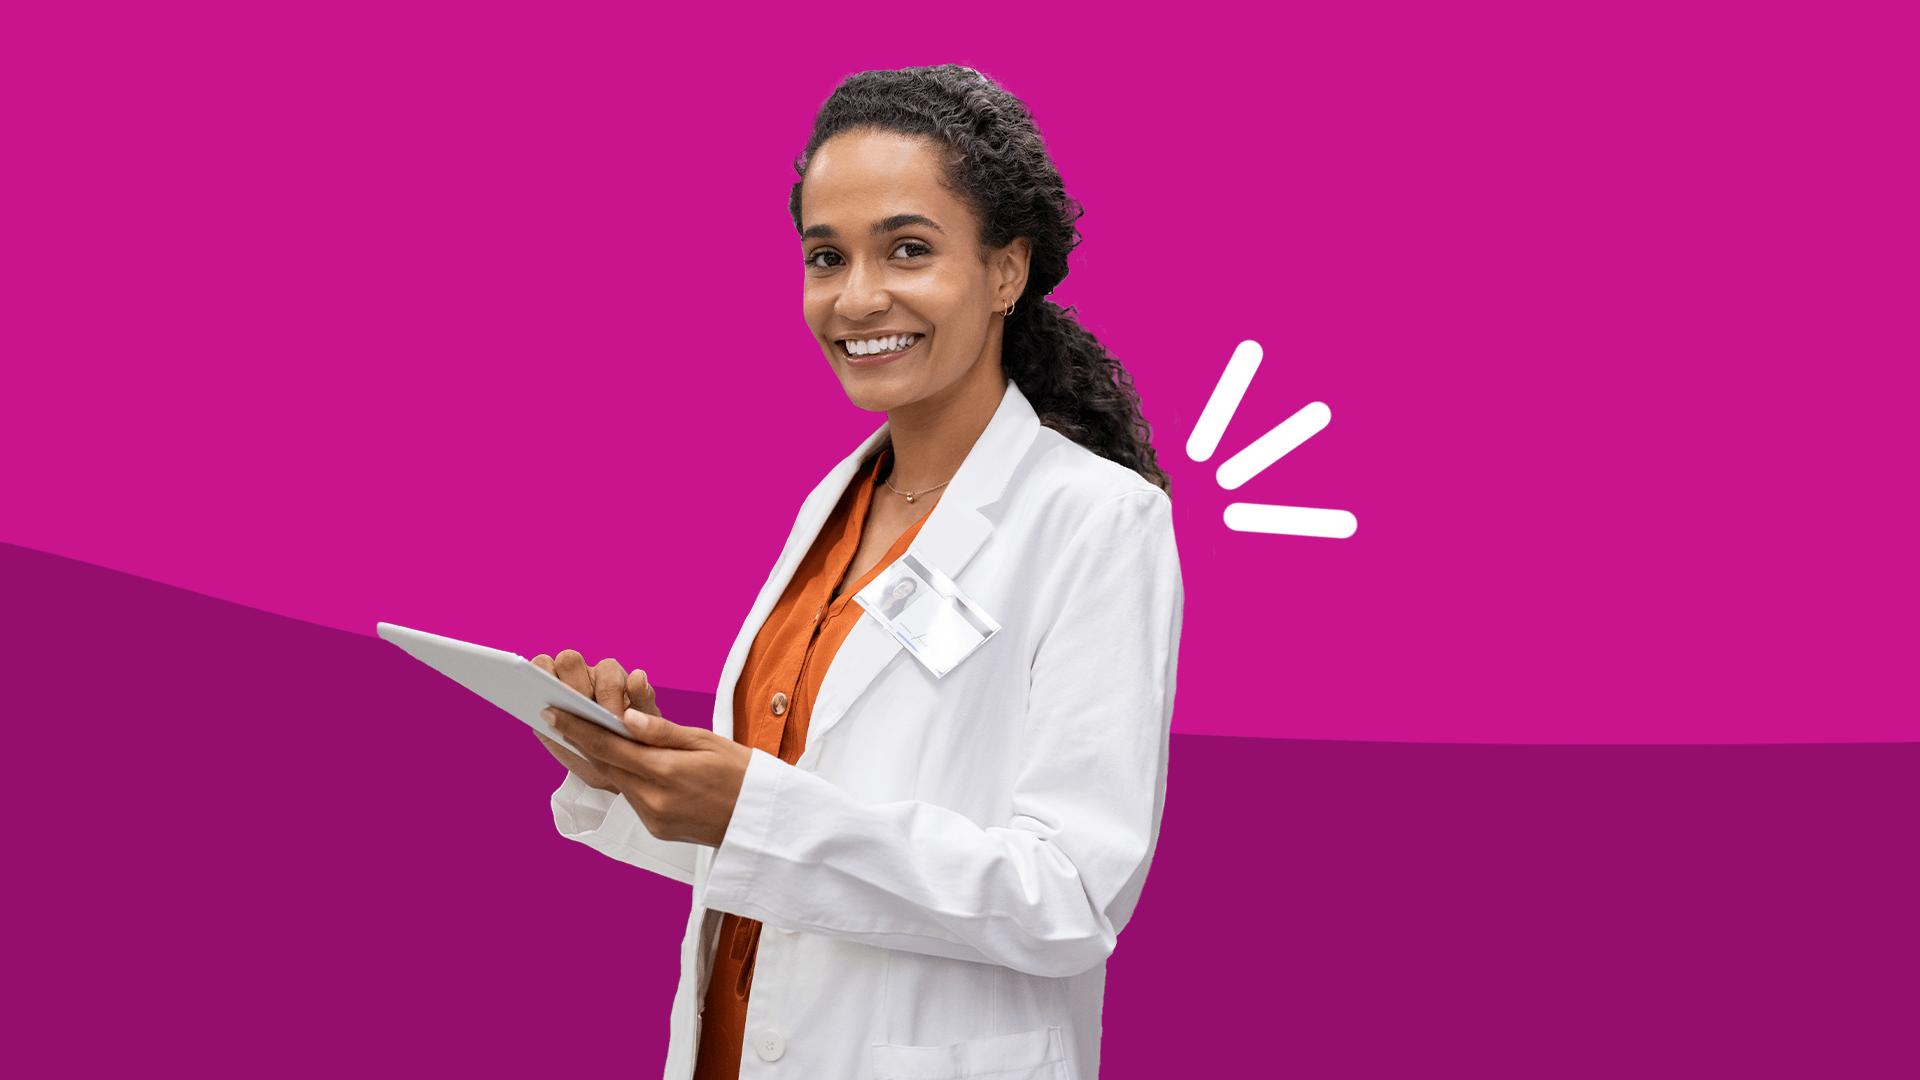 How my pharmacist helped me through IVF